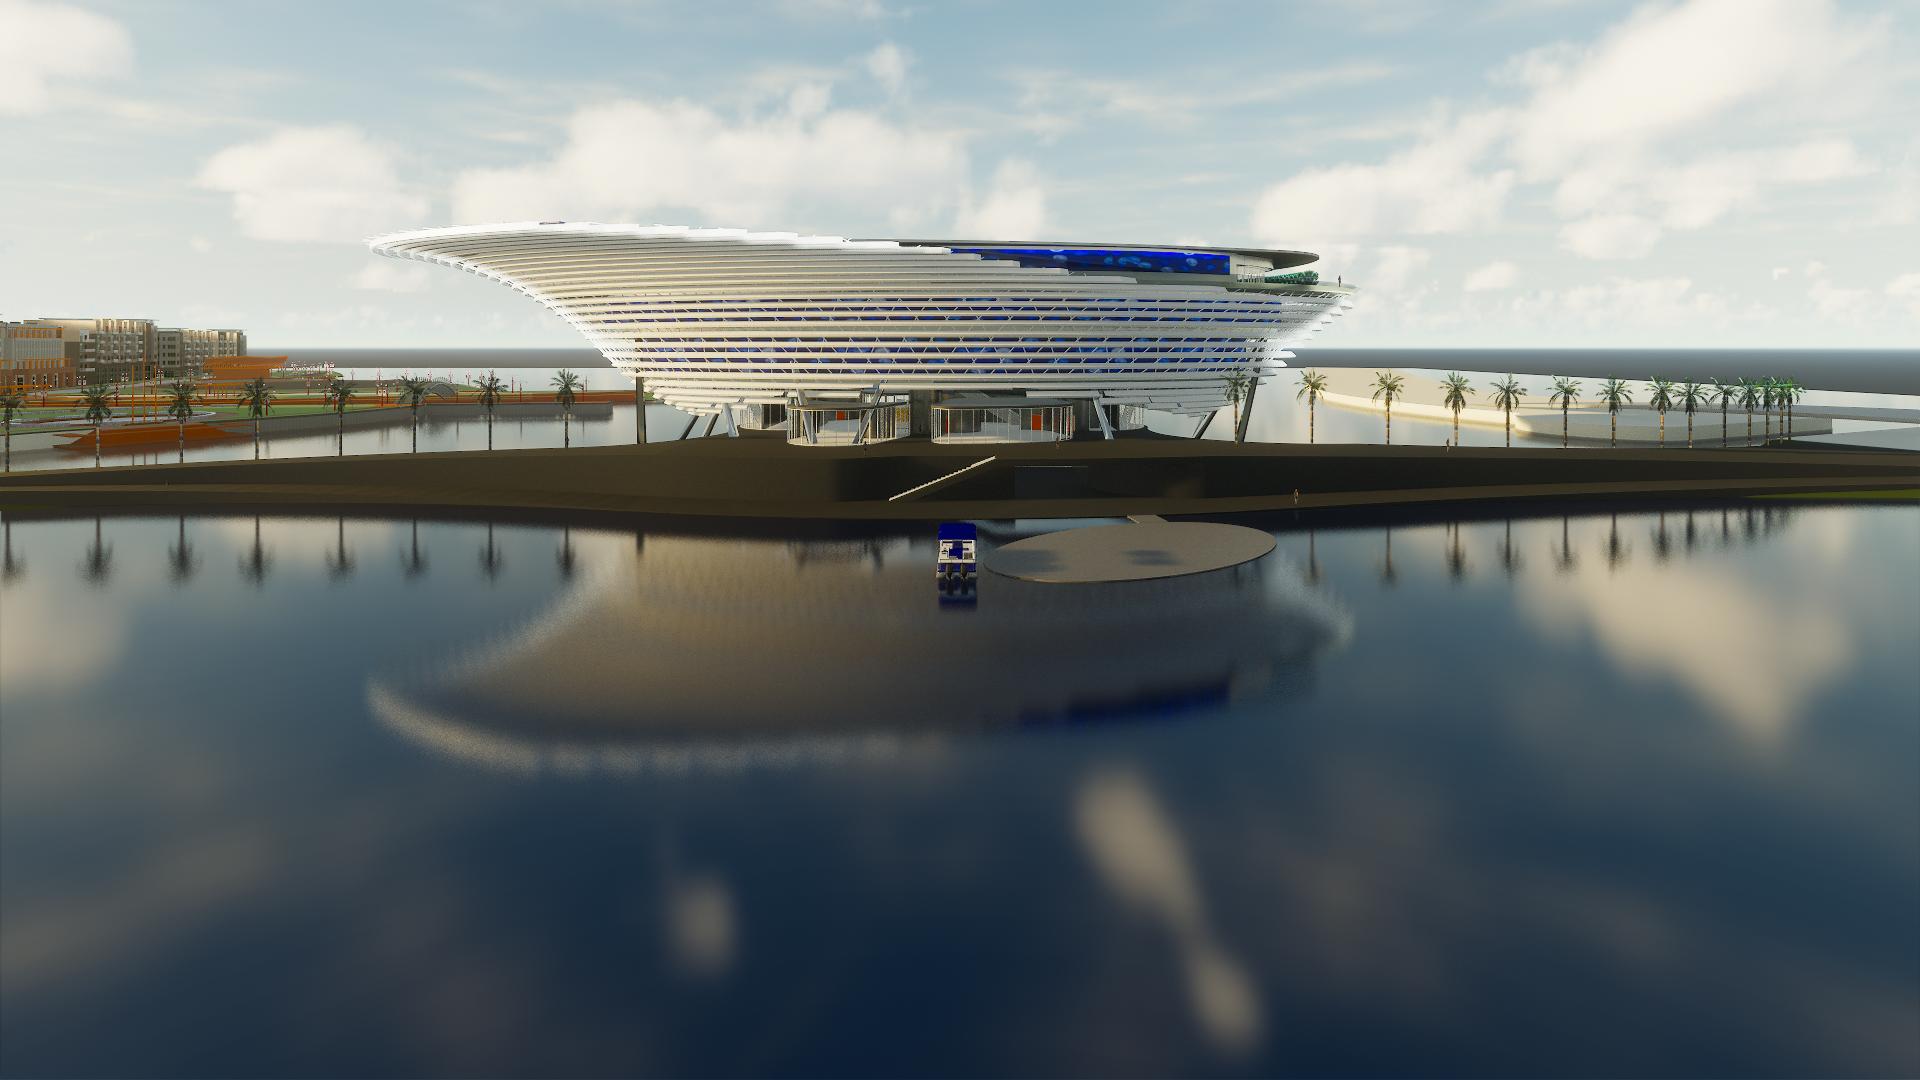 Sarasota County and Mote agree on terms for new Aquarium land | News &  Press | Mote Marine Laboratory & Aquarium